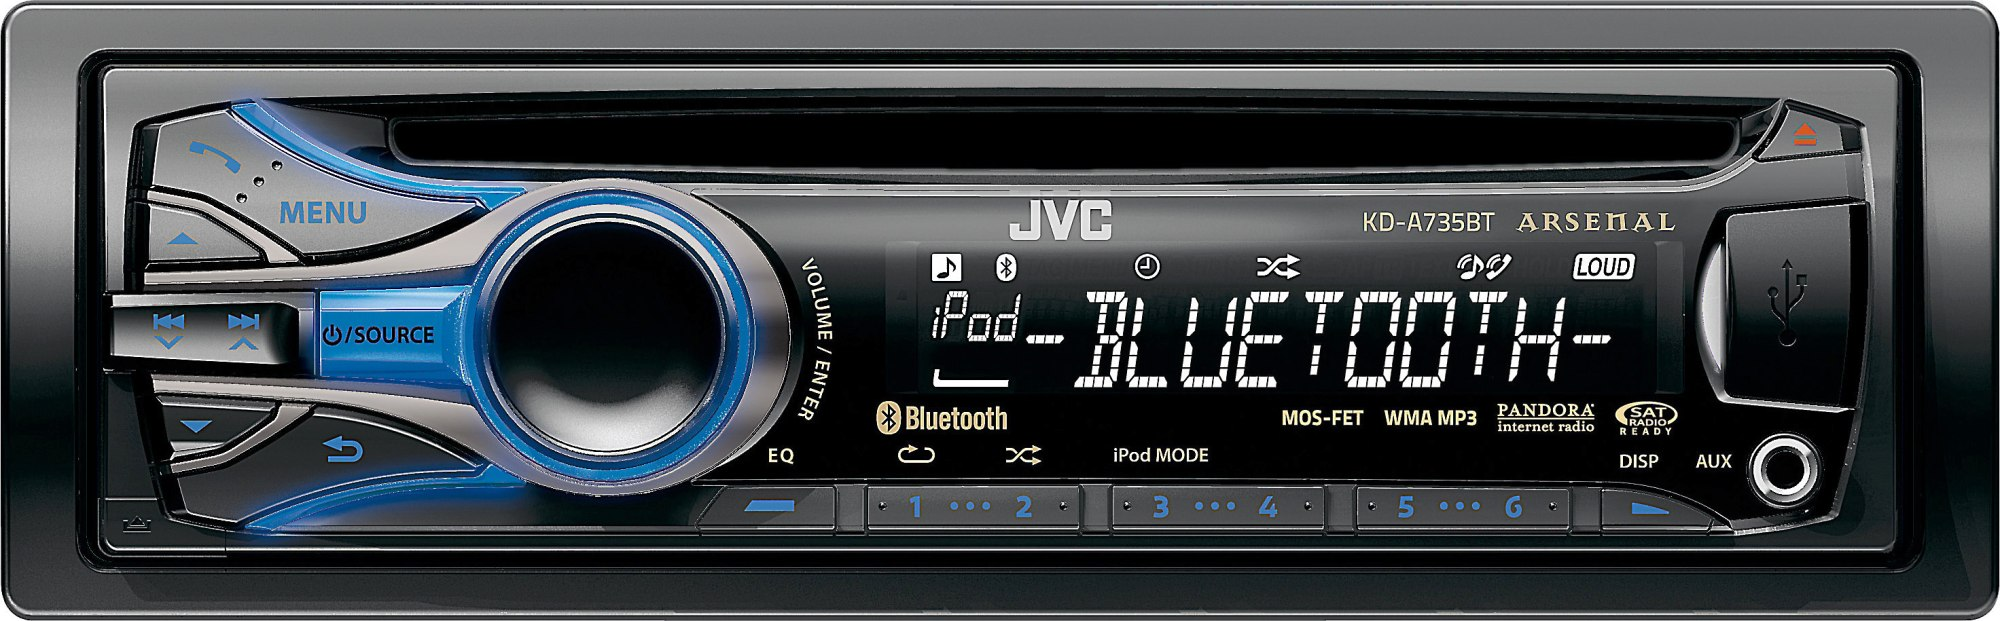 hight resolution of jvc kd r730bt car stereo wiring diagram wiring diagram imp jvc arsenal kd a735bt cd receiver